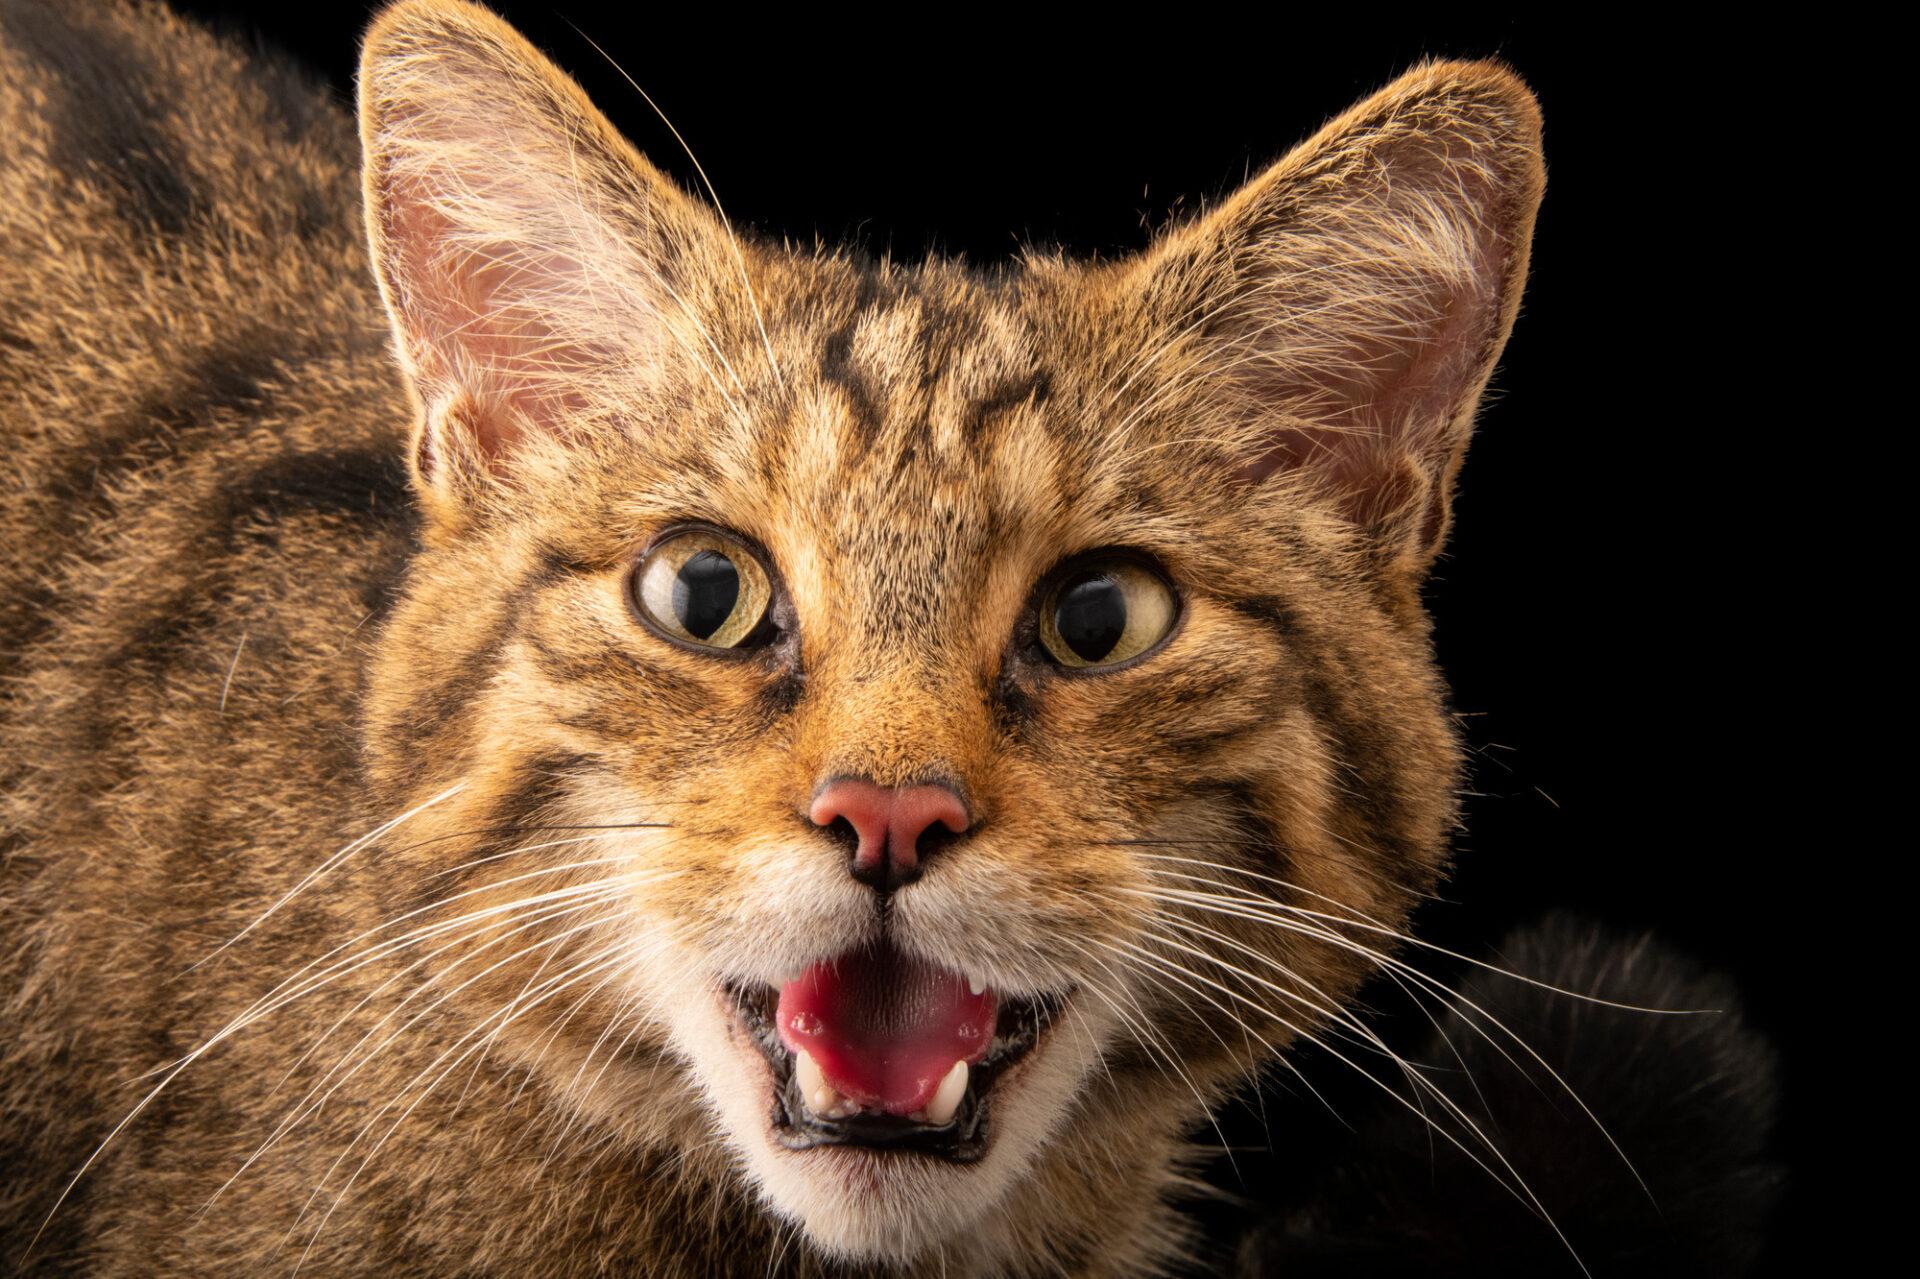 Photo: A Scottish wildcat, Felis silvestris grampia, at Wildwood Trust near Canterbury, England.